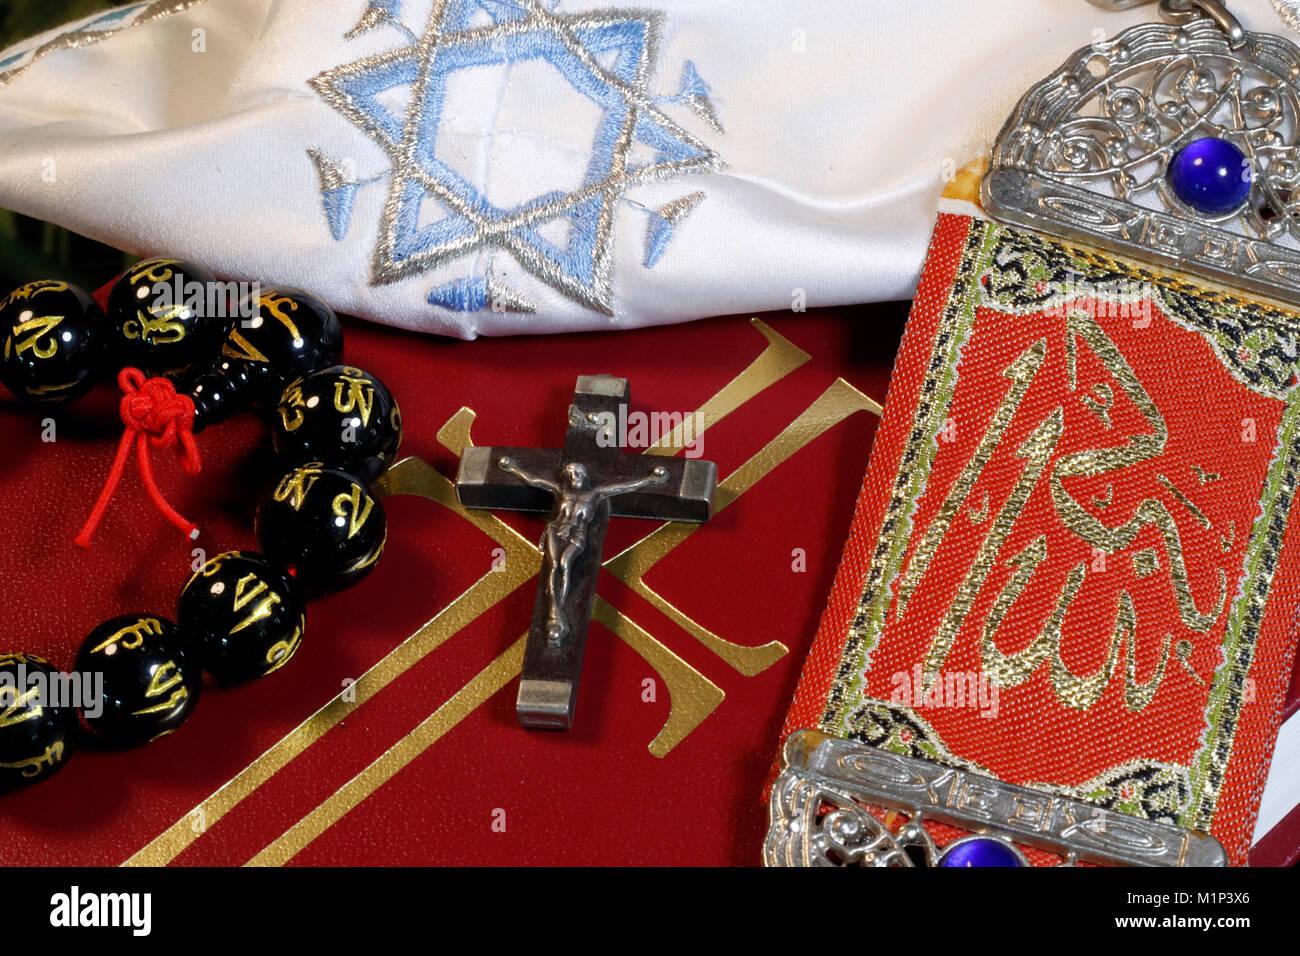 Christianity, Buddhism, Islam and Judaism, interfaith symbols of Bible, crucifix, Kippah, Allah monogram and Mala, - Stock Image